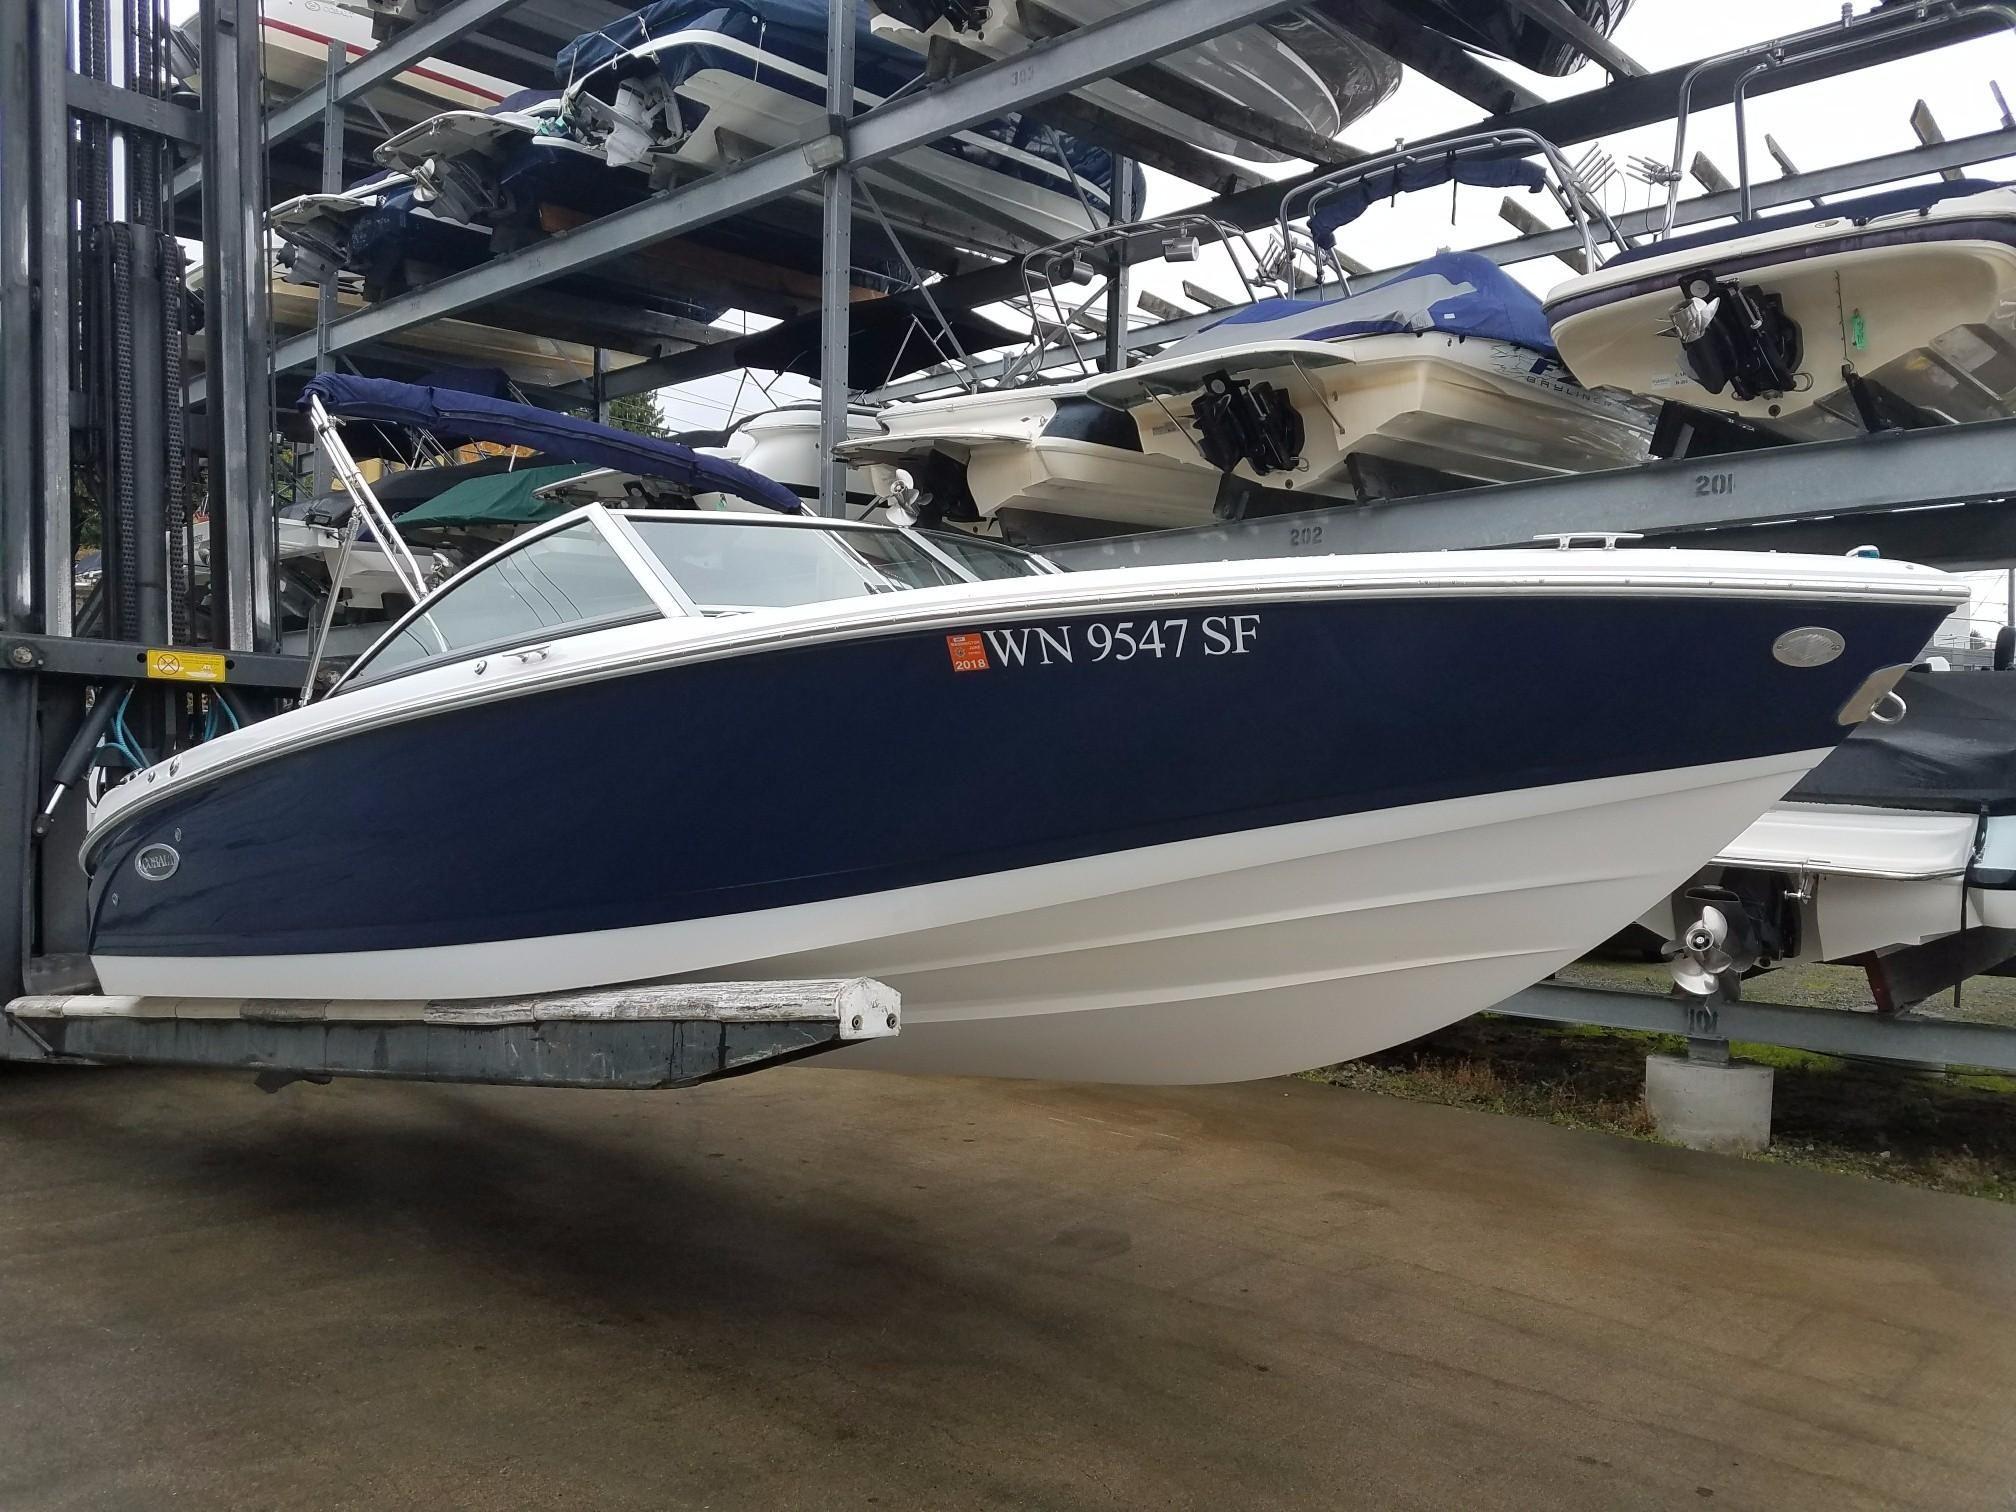 2015 Cobalt 220s Power Boat For Sale